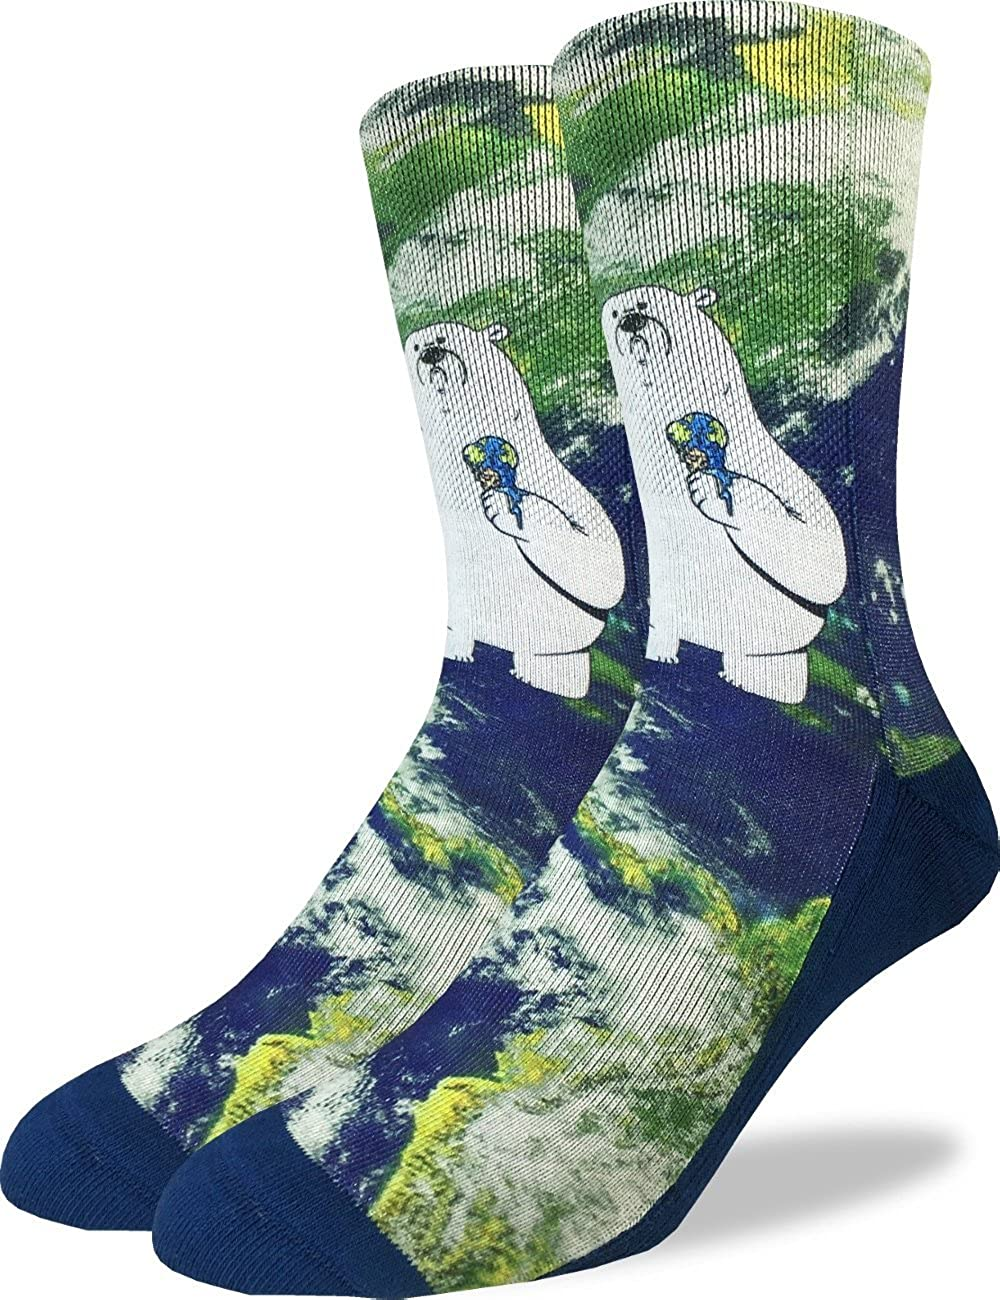 Good Luck Sock Men's Global Warming Polar Bear Crew Socks - Adult Shoe Size 8-13